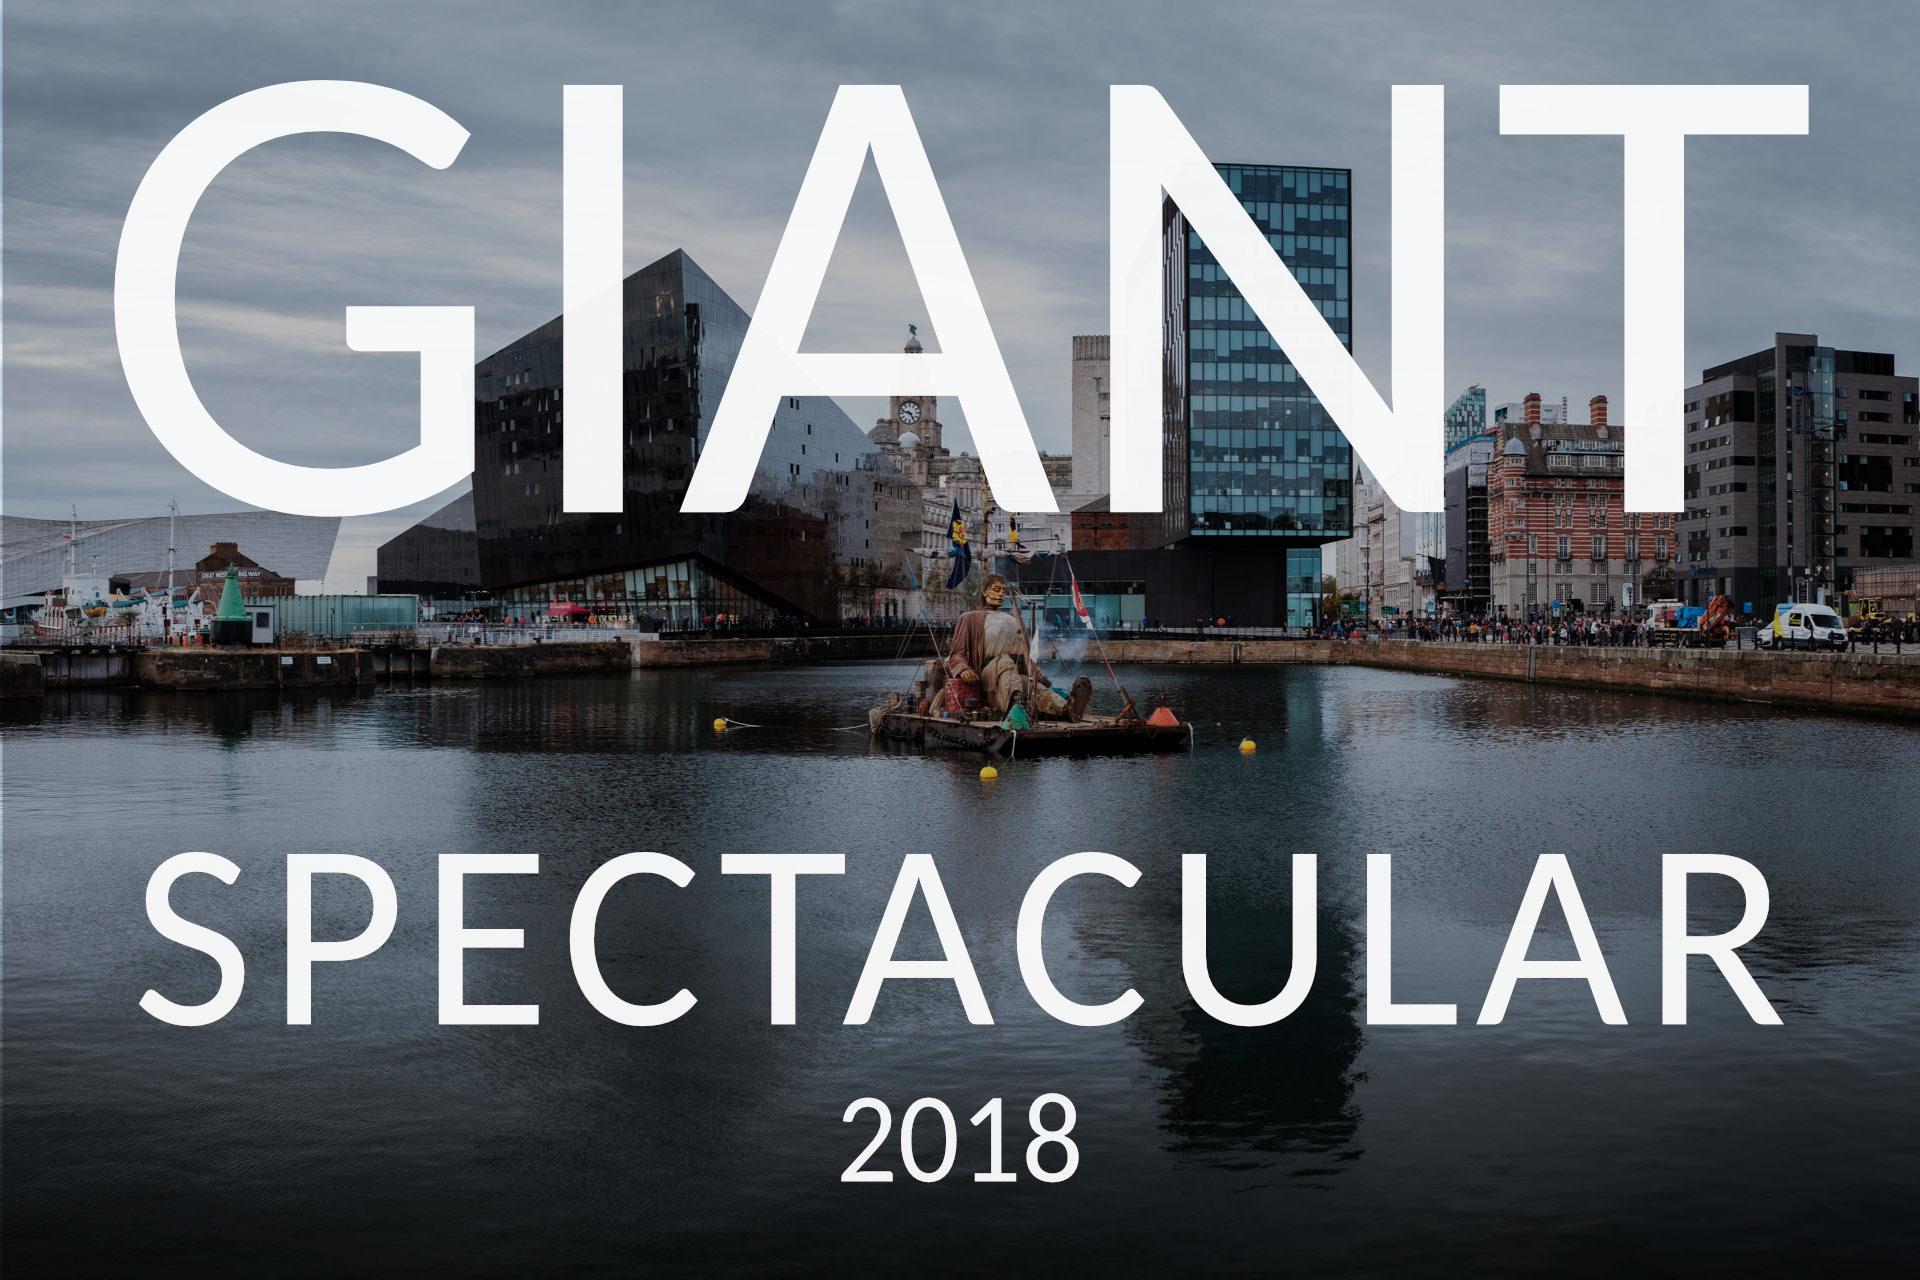 Giant Spectacular.jpg